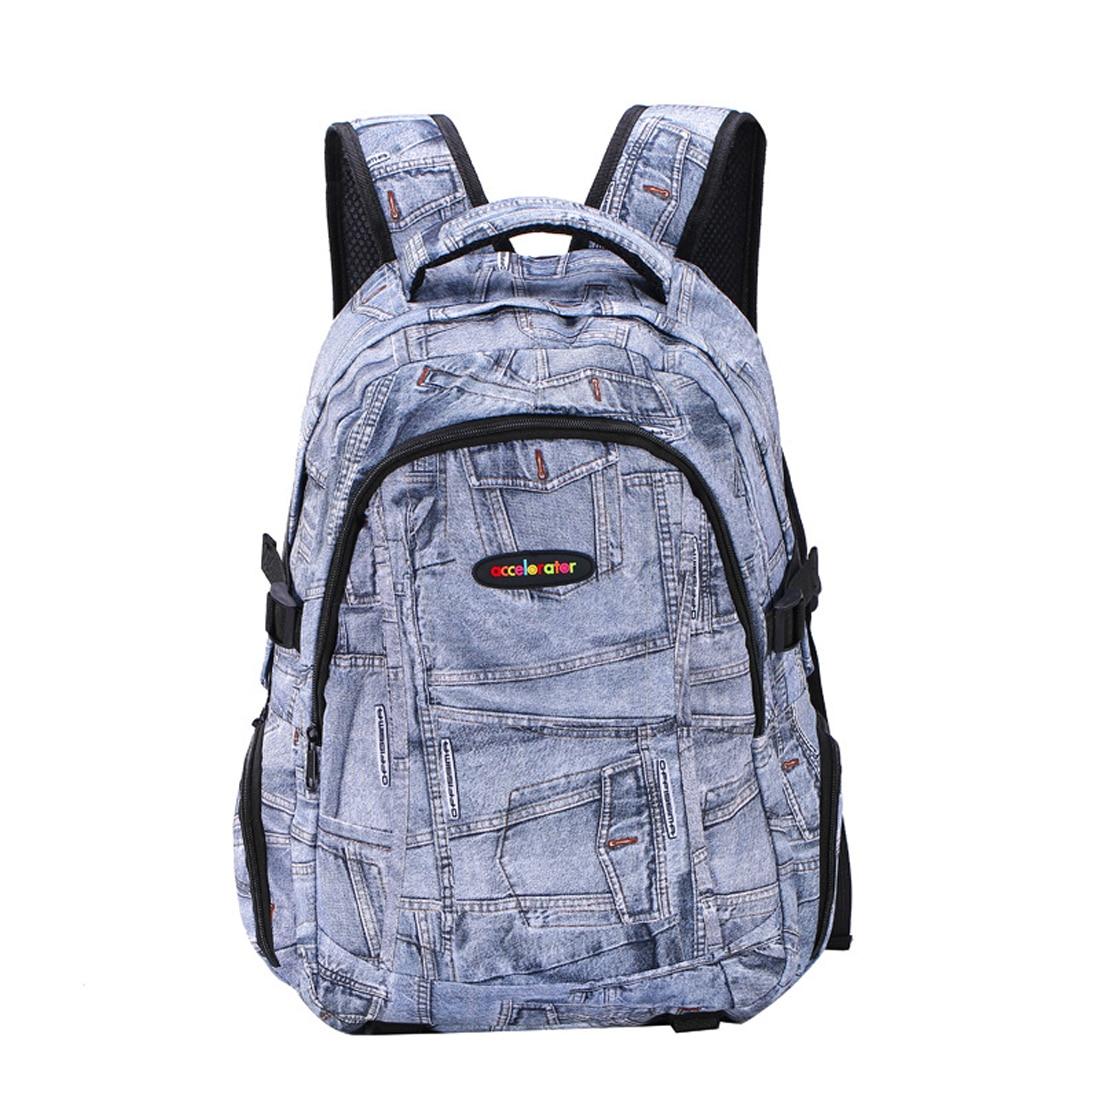 Bags for high school students - Sfg House Women And Men Denim Backpack High School Students Shoulder Bag School Bags Girls Teenagers Backpacks Casual Travel Bag